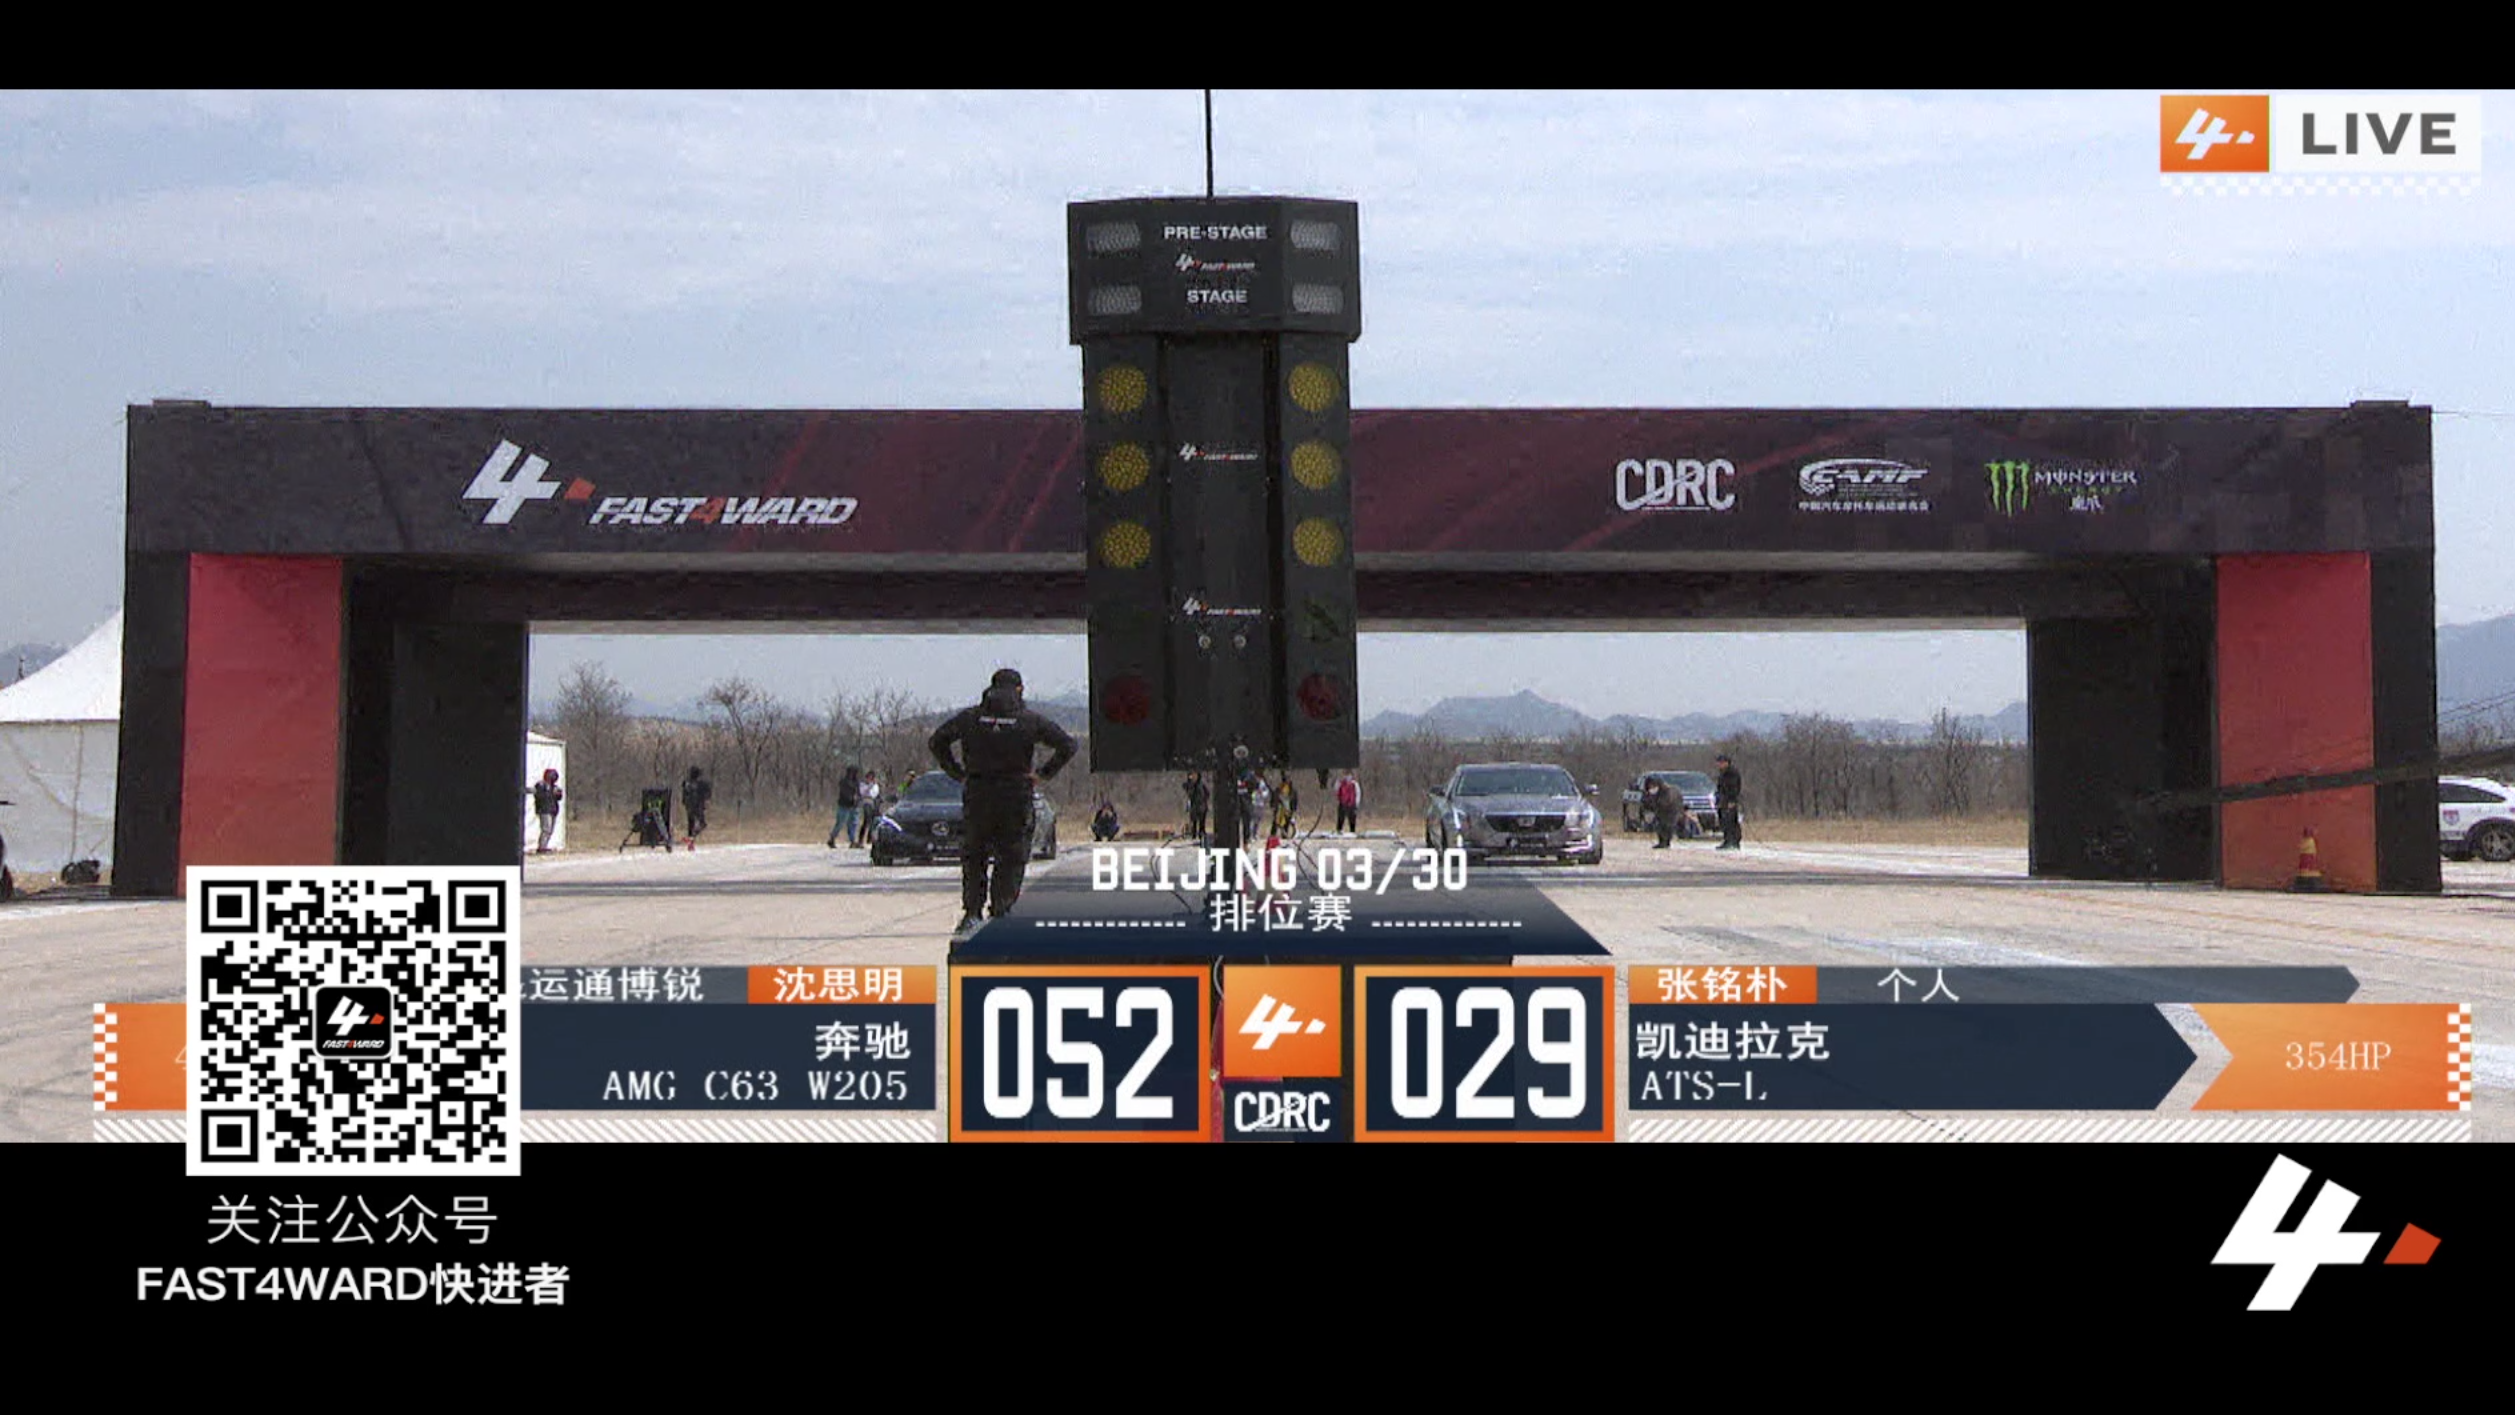 FAST4WARD  北京站 奔驰amg c63 vs 凯迪拉克atsl